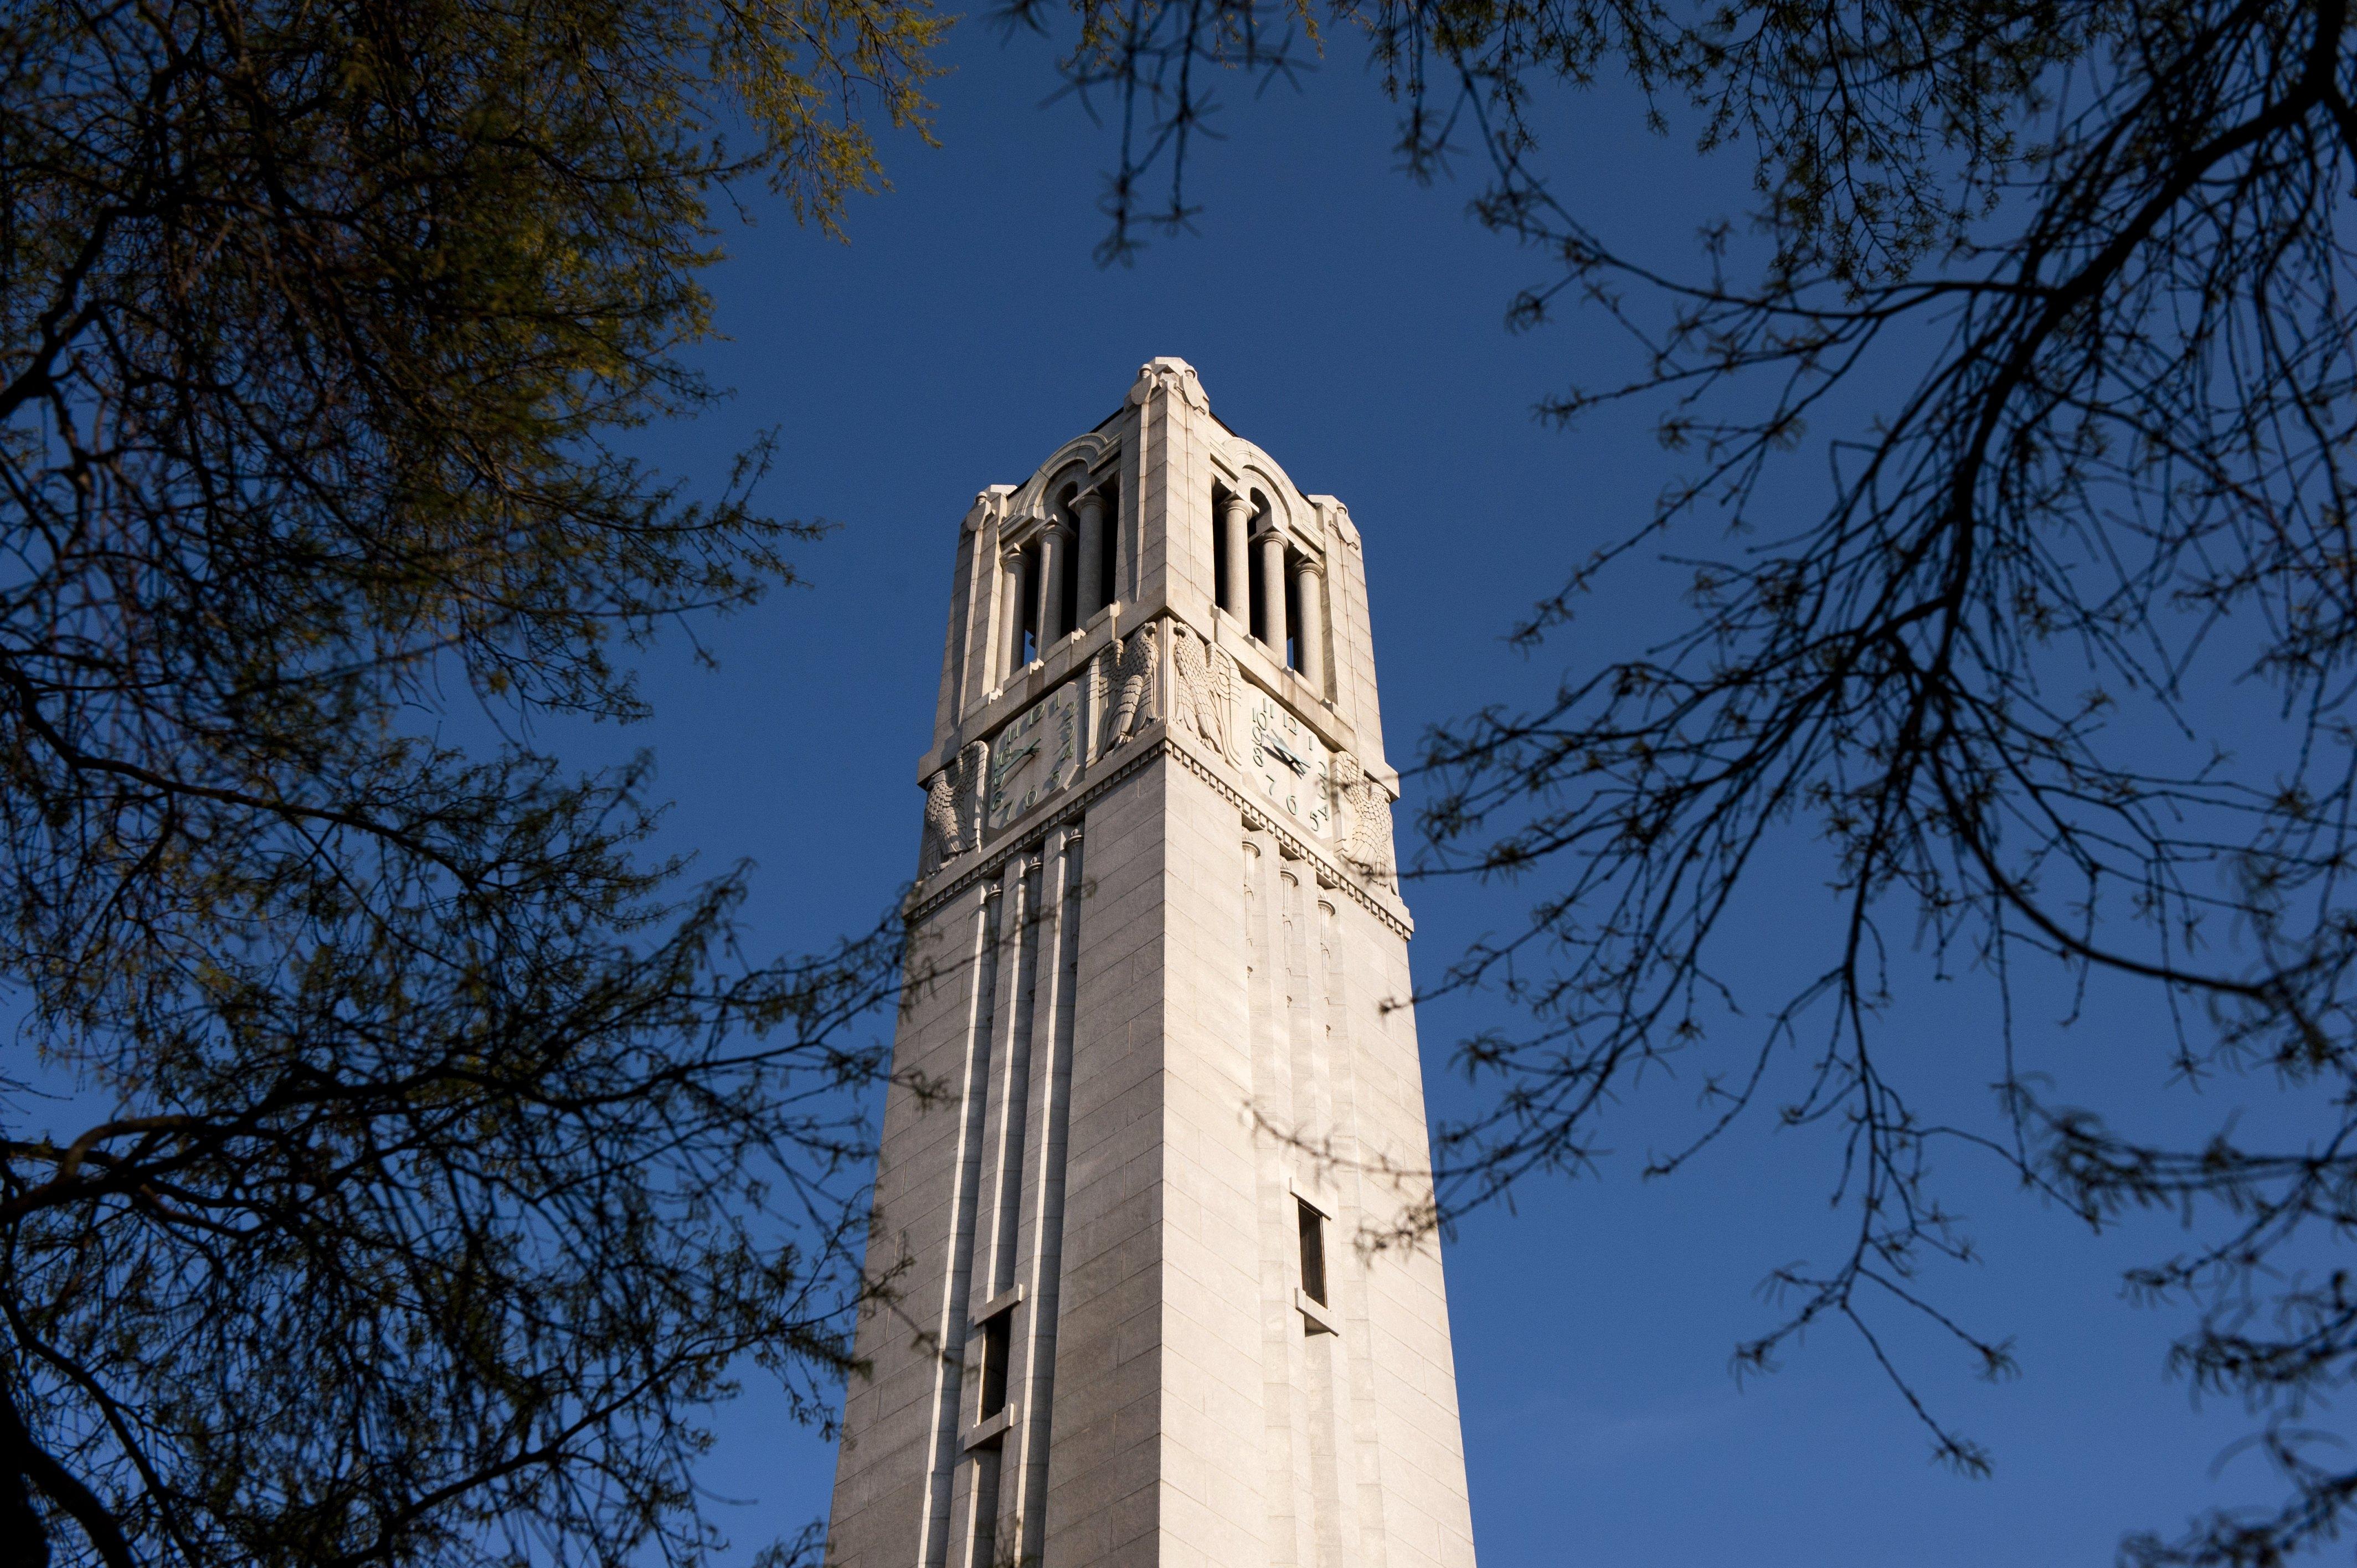 North Carolina State University Campus